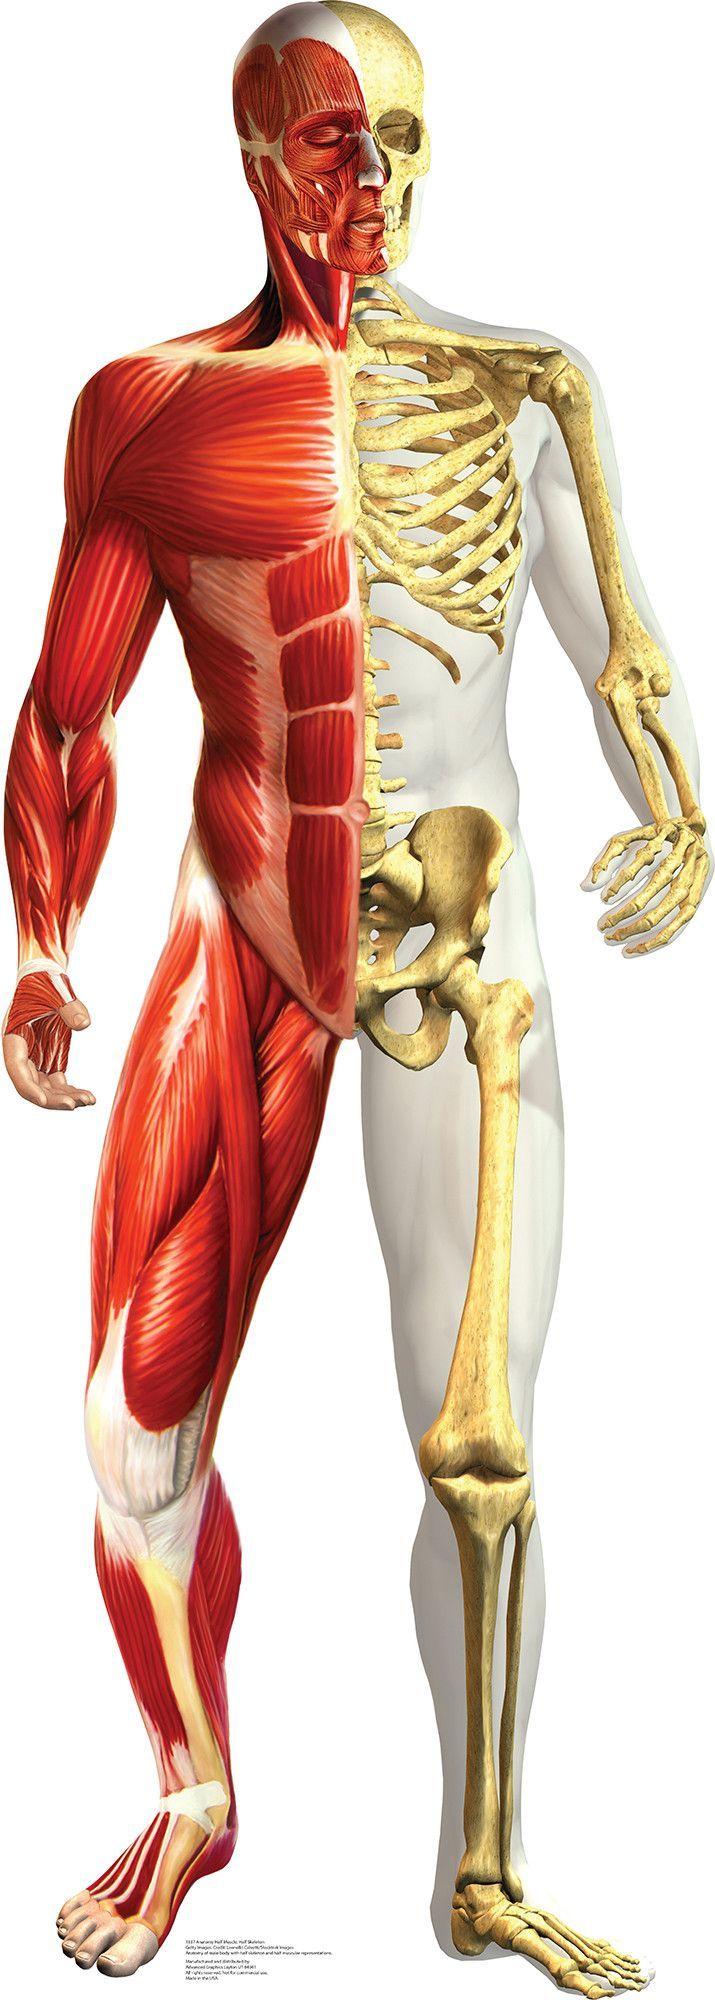 Anatomy Half Muscle Half Skeleton Cardboard Standup Anatomy Drawing Anatomy For Artists Human Anatomy